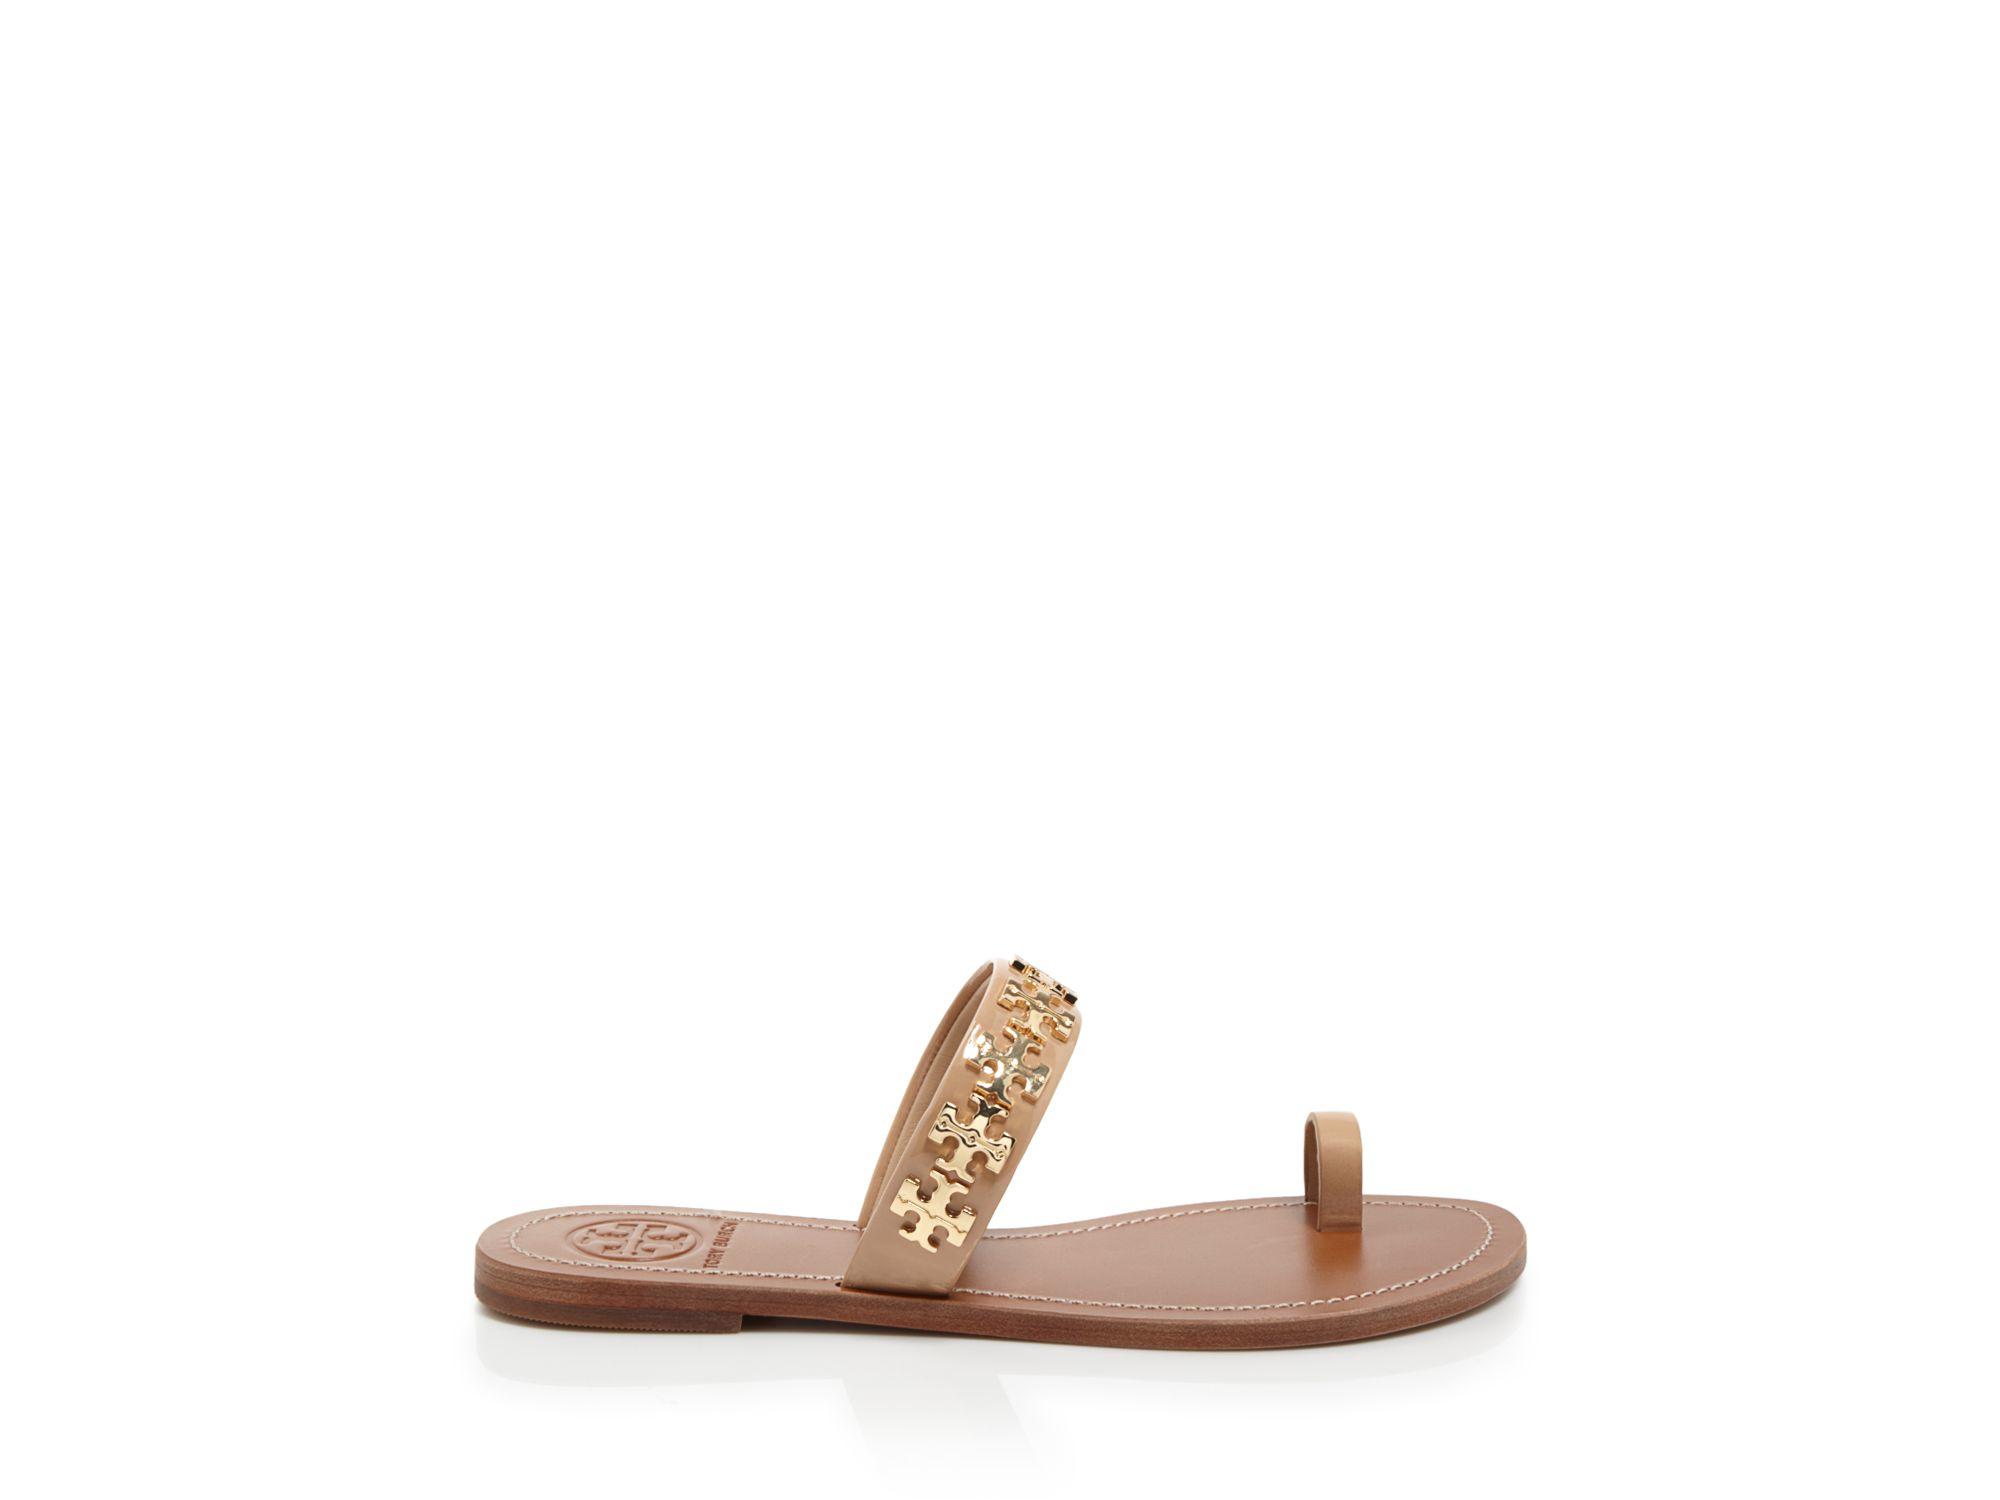 Tory Burch Logo Toe Ring Flat Sandals